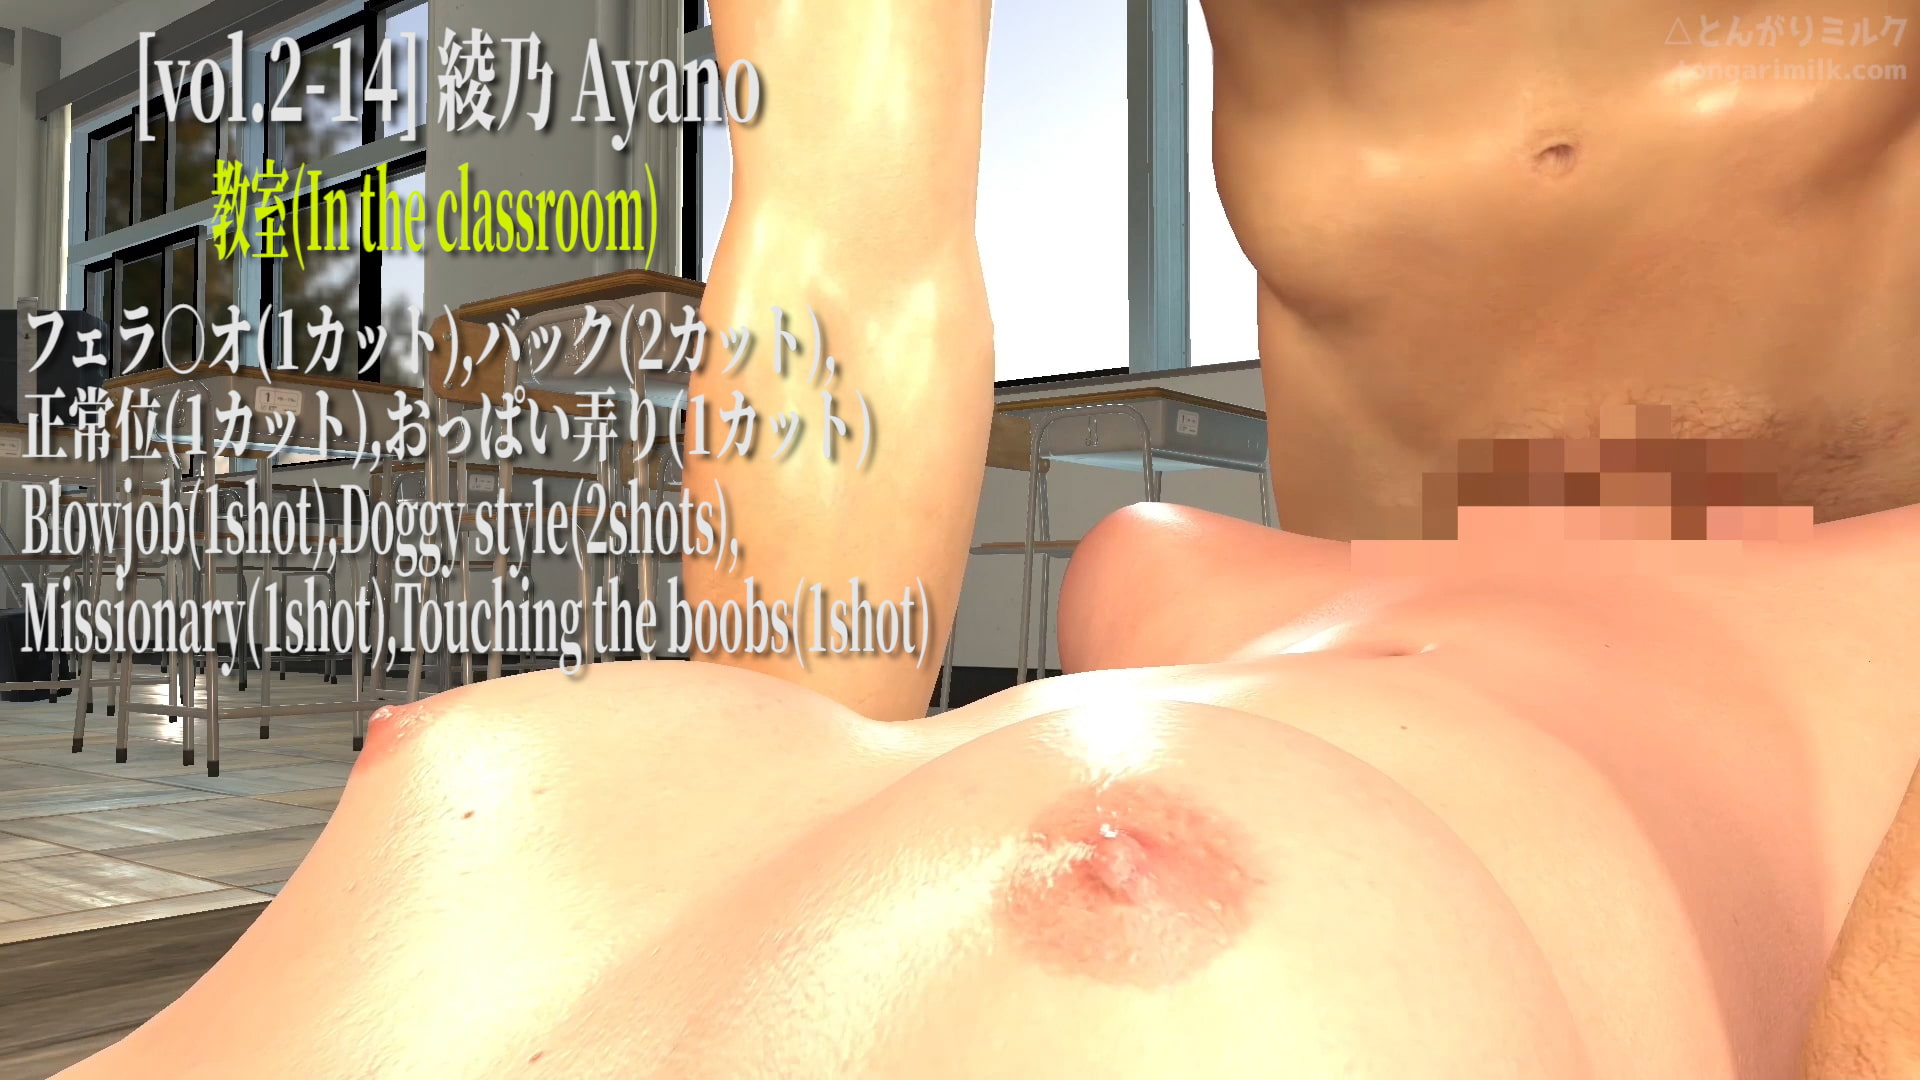 RJ331975 とんがりミルクのムフフ動画15本セット 第2弾 (Set of 15 videos of the Japanese naughty girls, Vol. 2) [20210617]